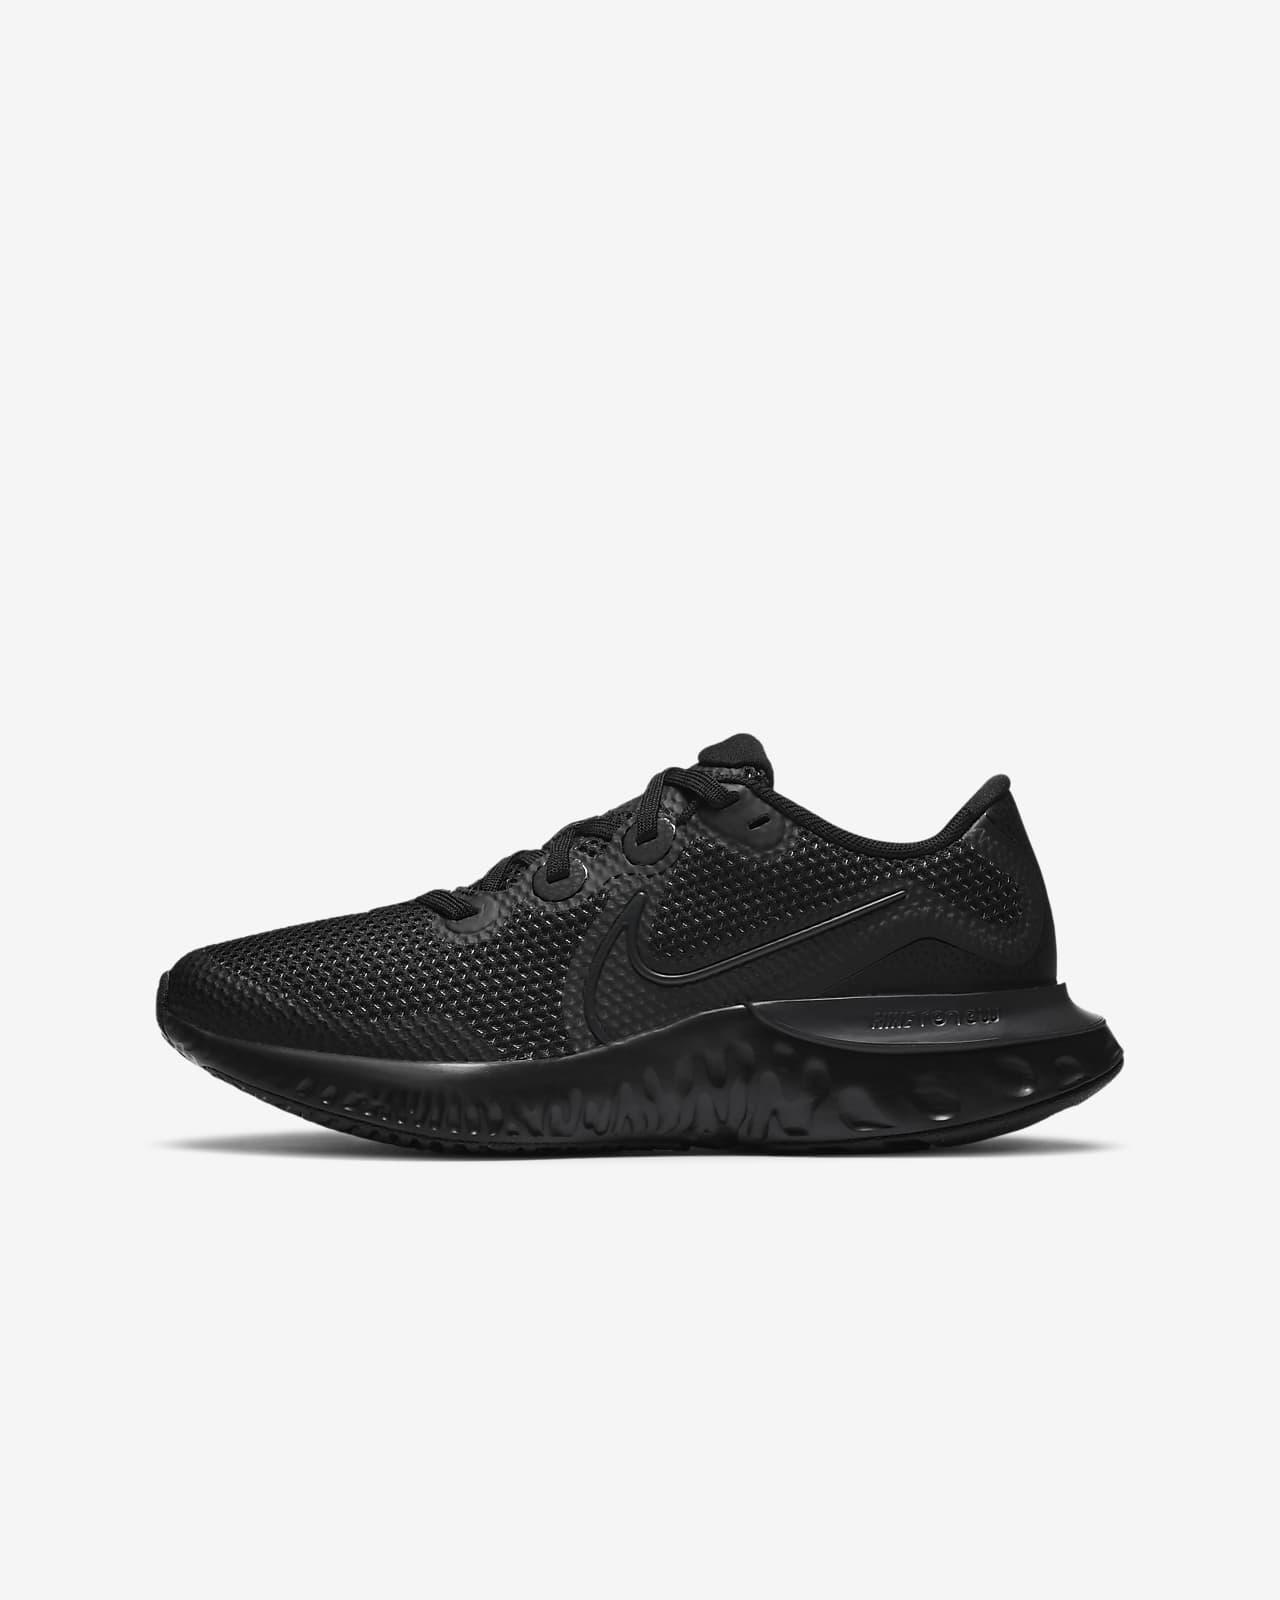 Nike Renew Run Zapatillas de running - Niño/a